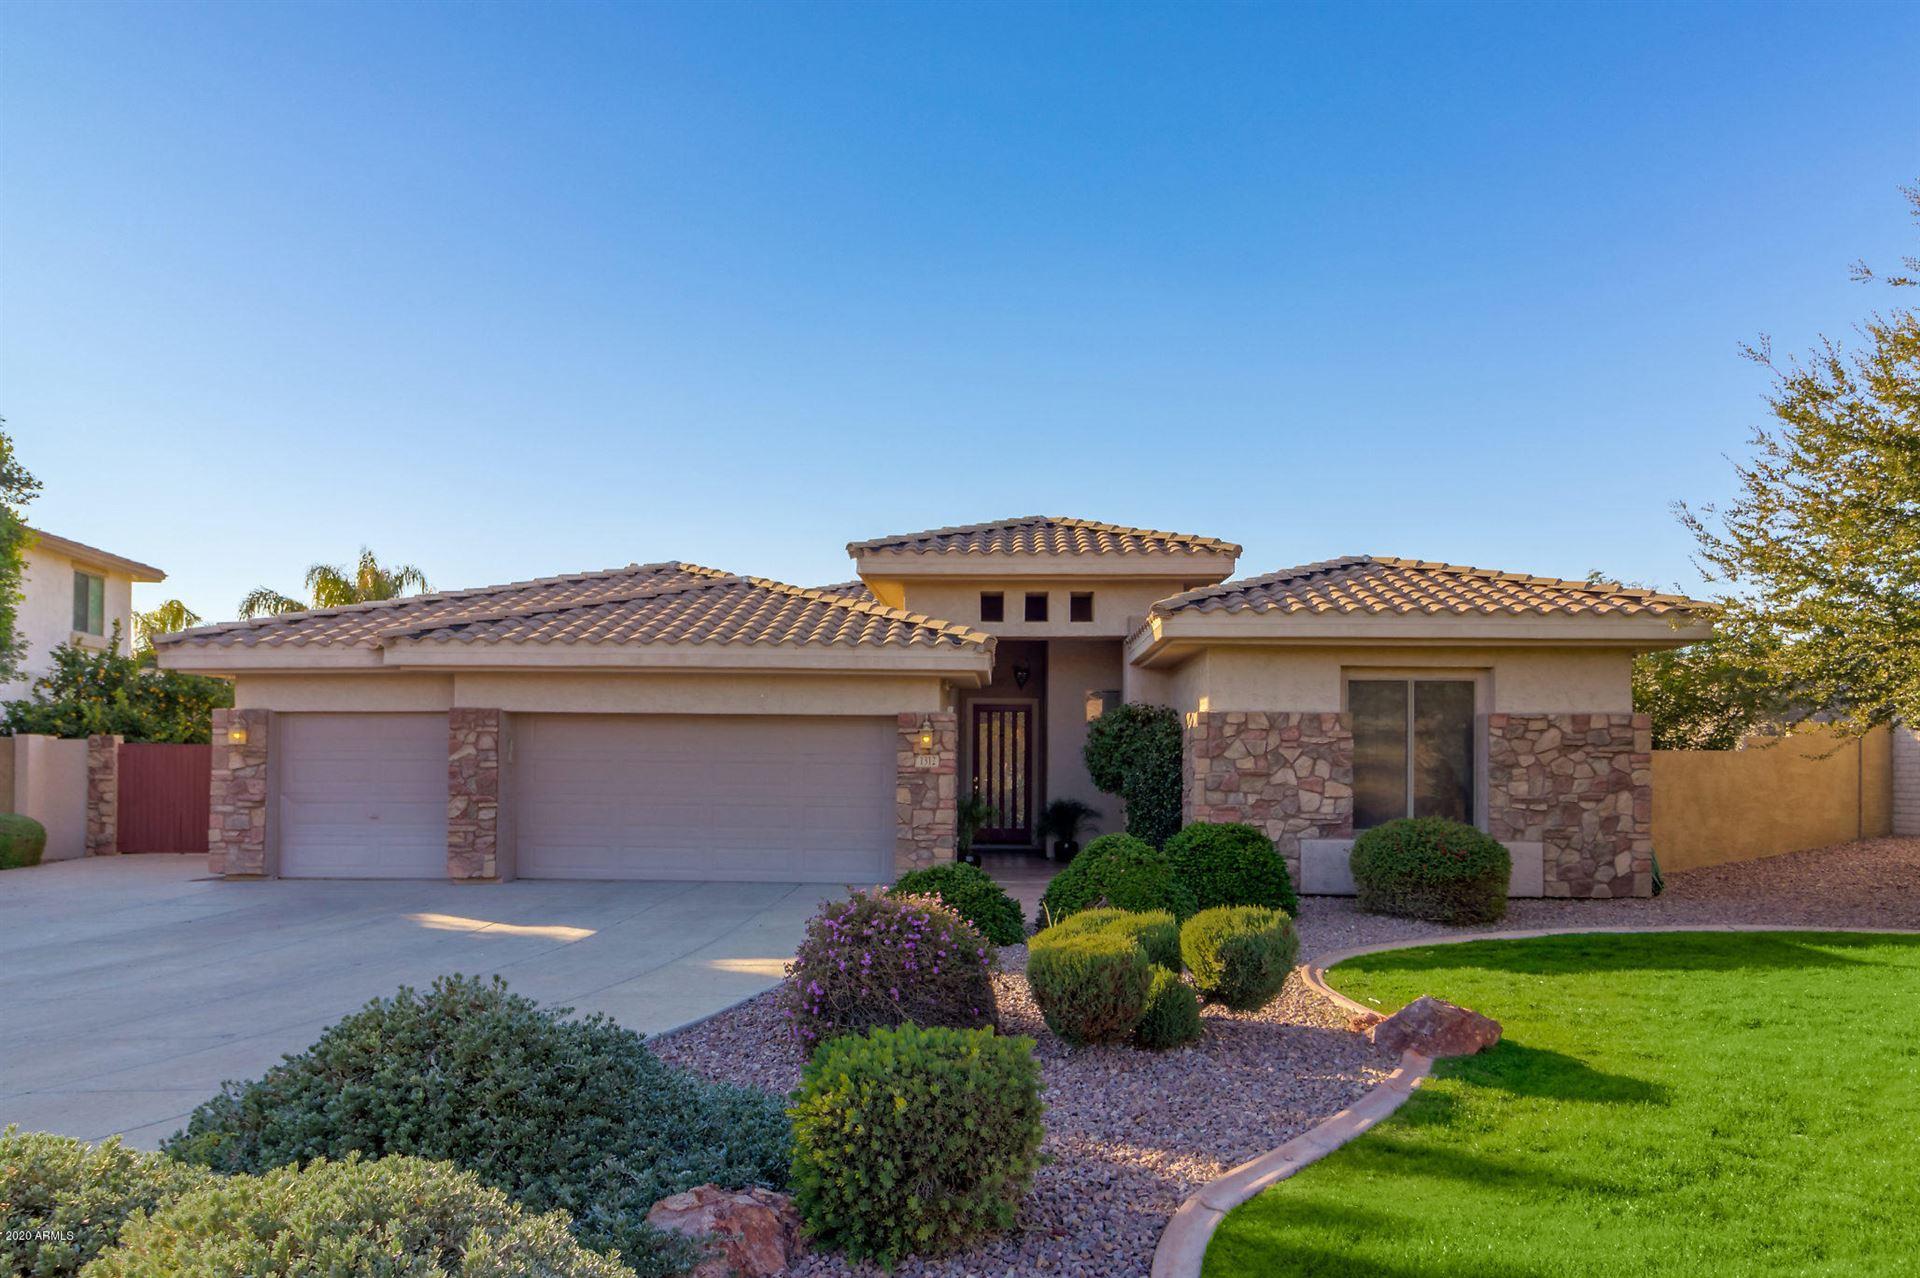 1312 S NEBRASKA Place, Chandler, AZ 85286 - MLS#: 6130555